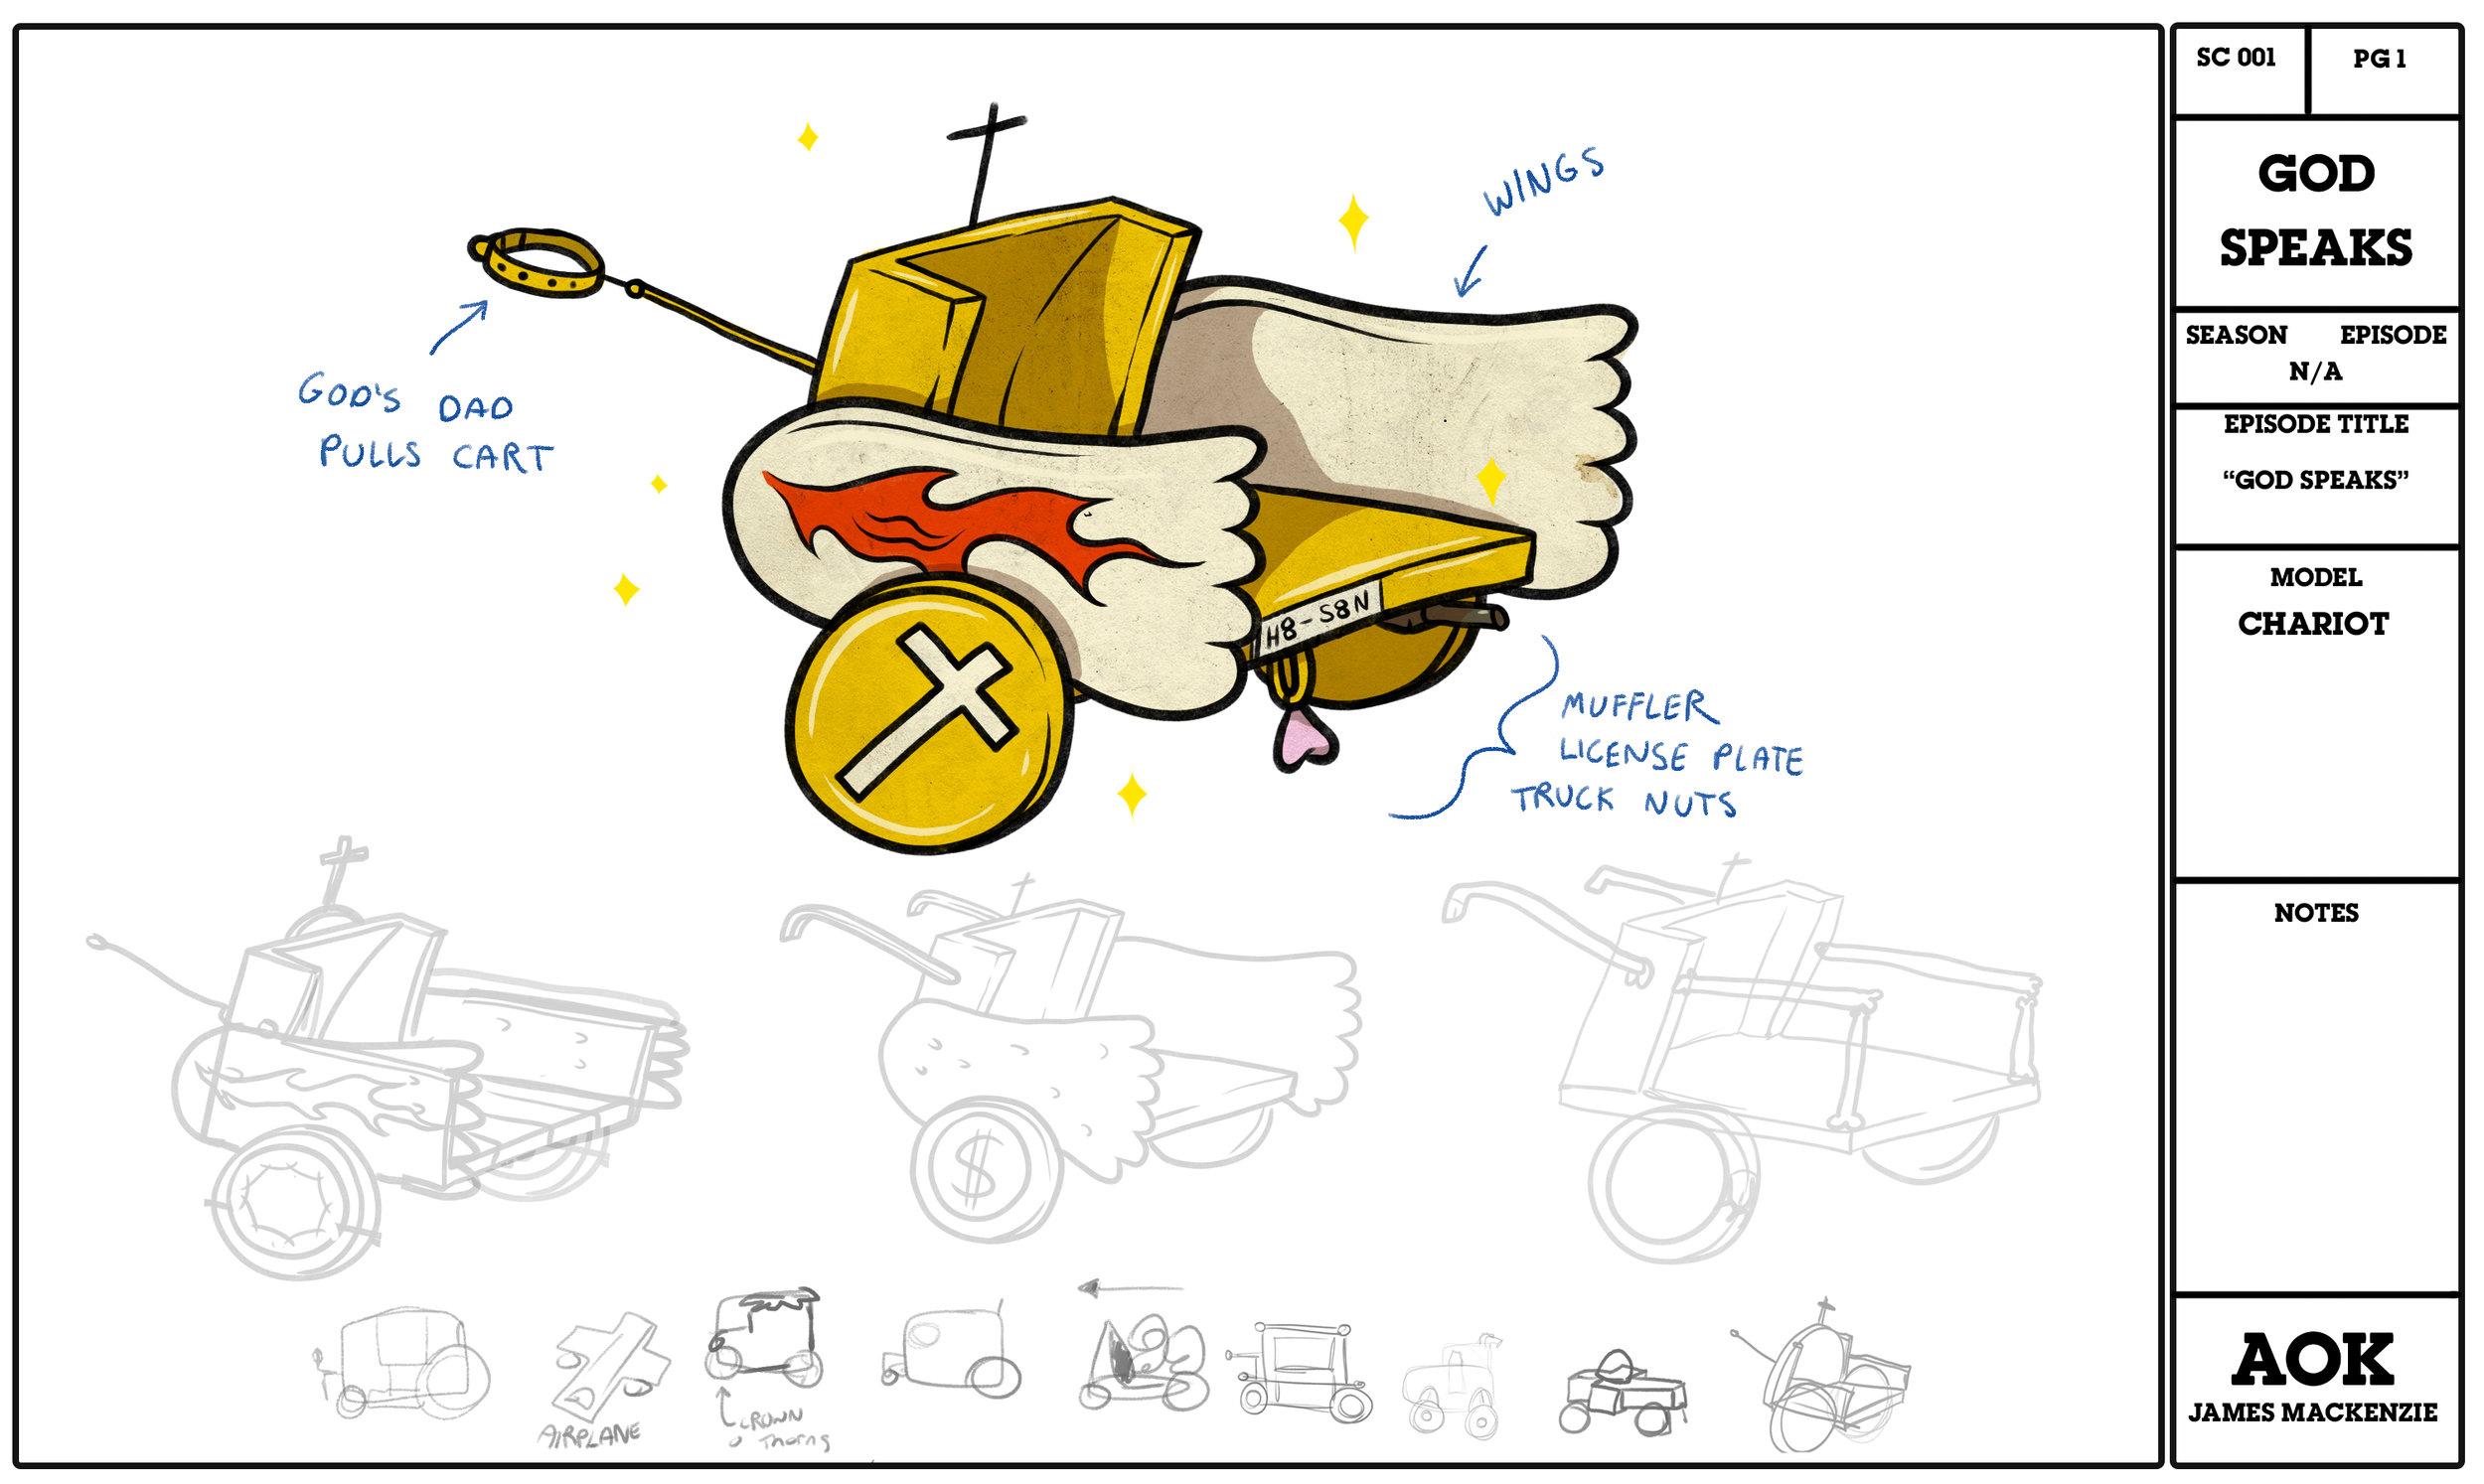 GODSPEAKS_AOK2017_CHARIOT.jpg